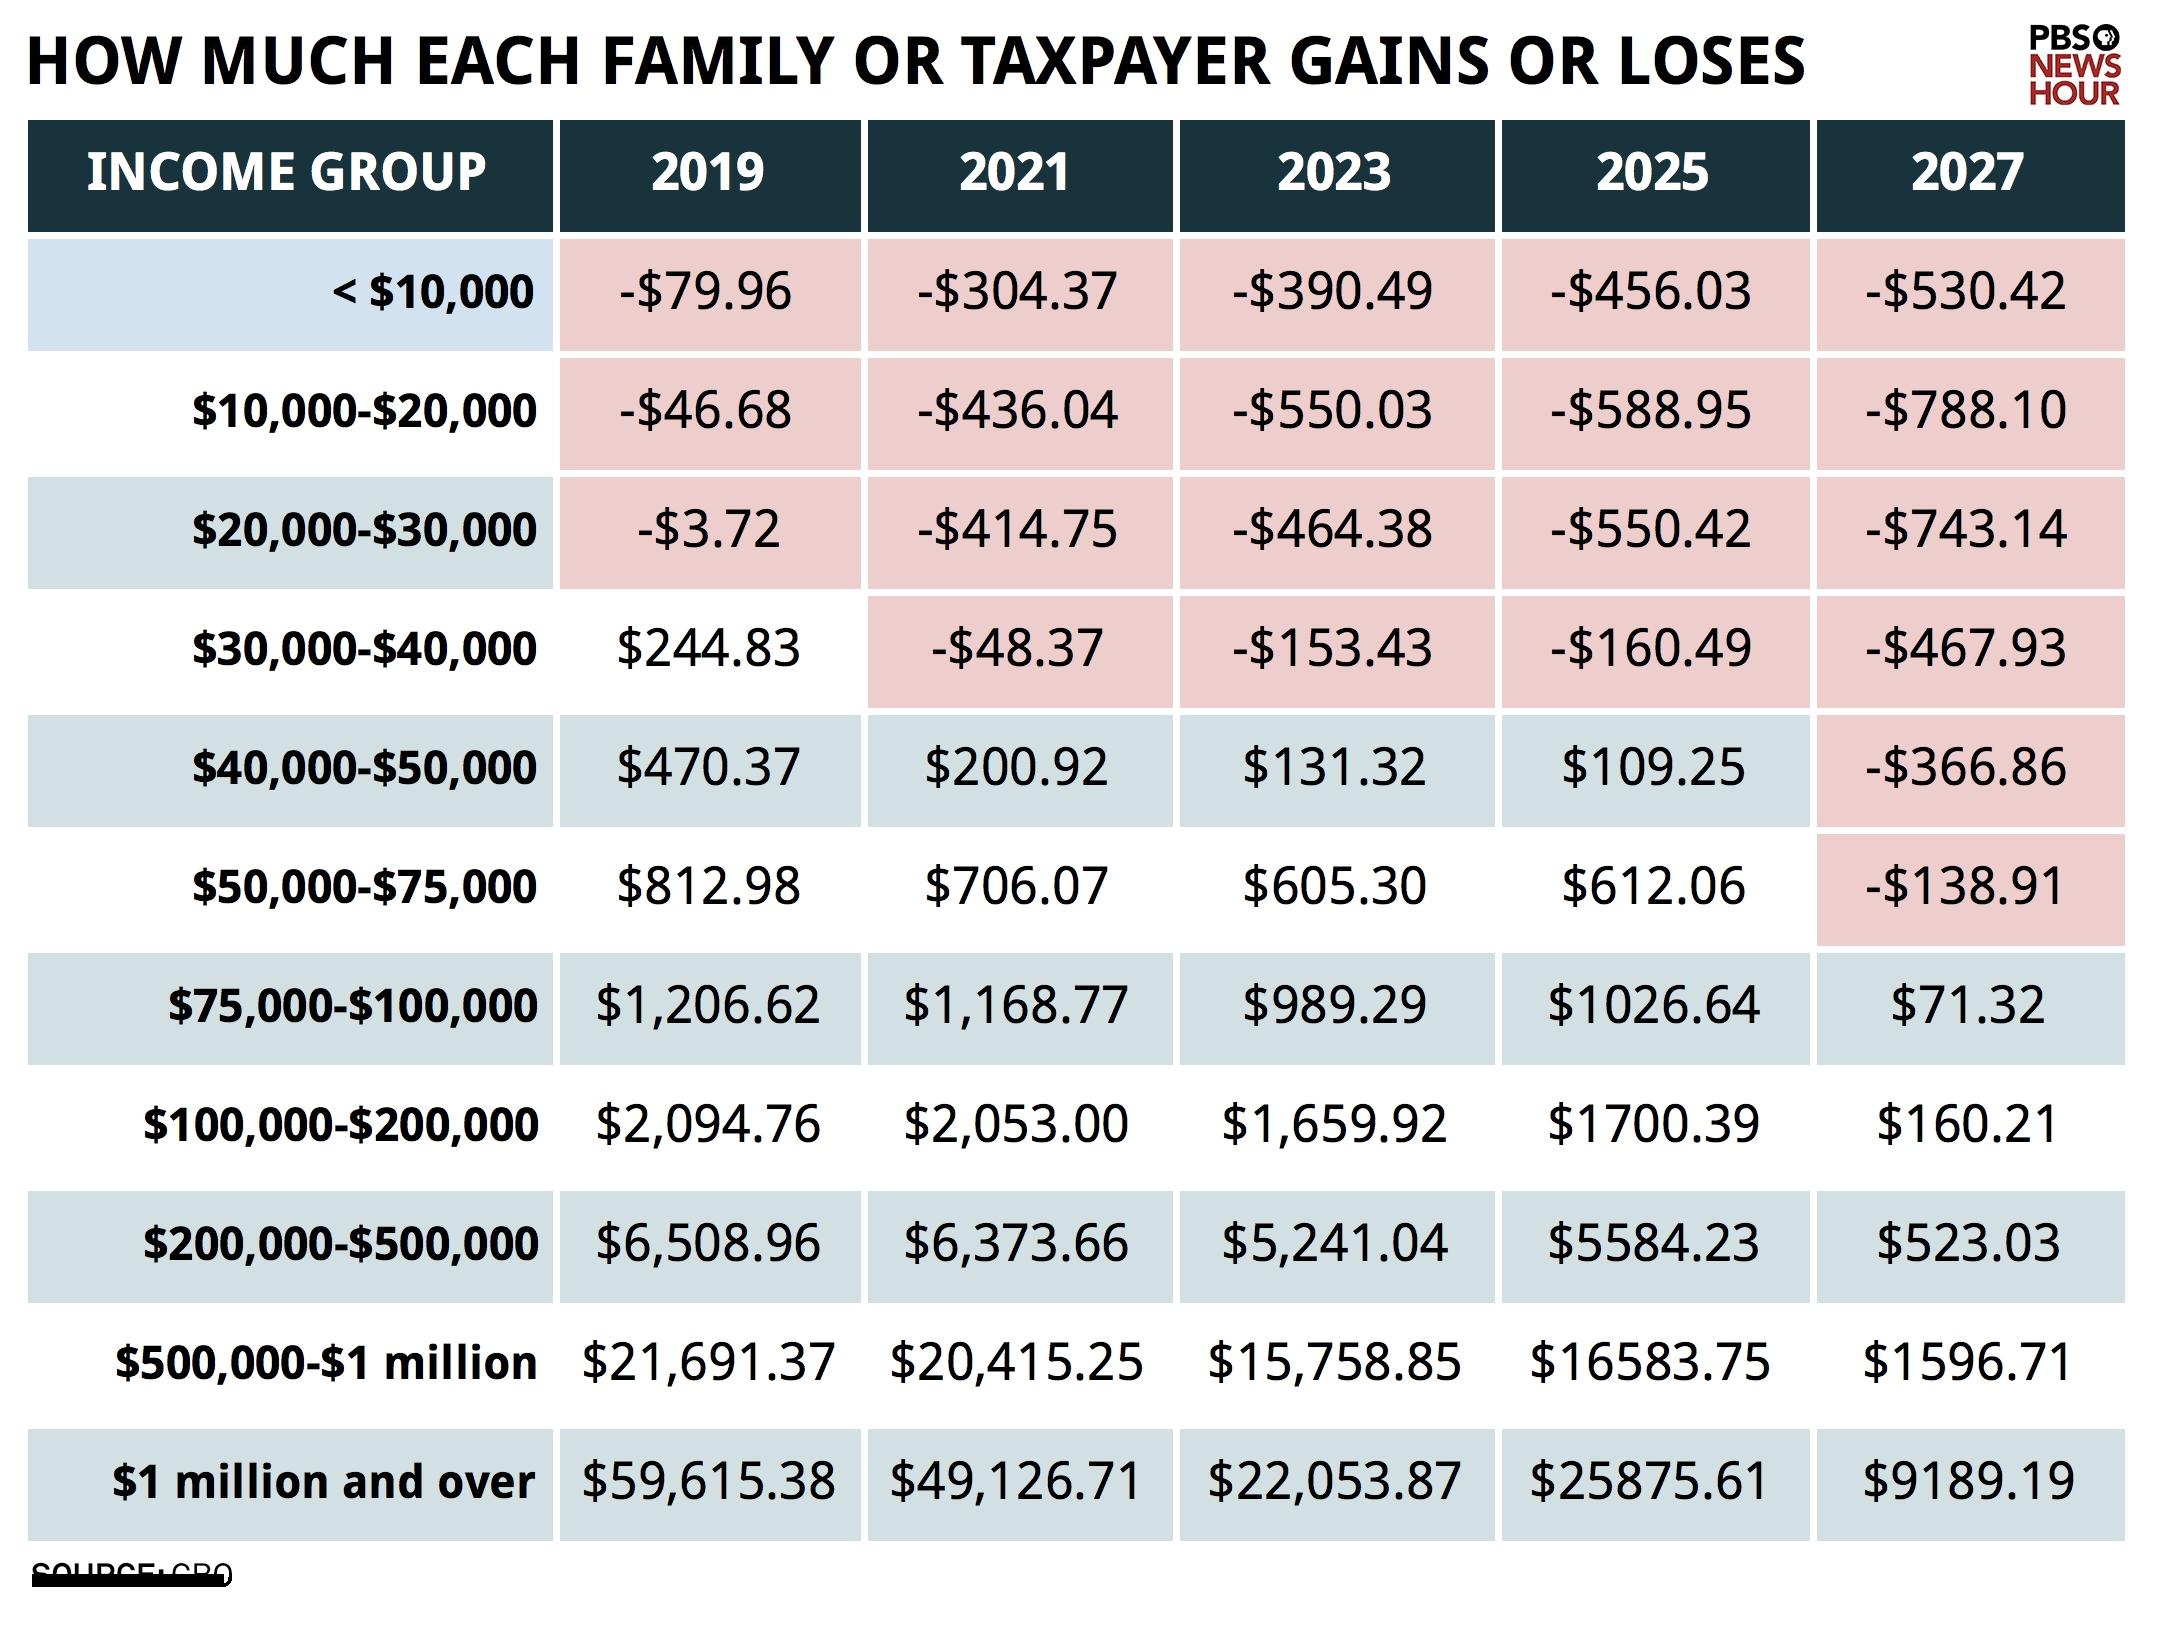 Alabama Property Tax Exemption H